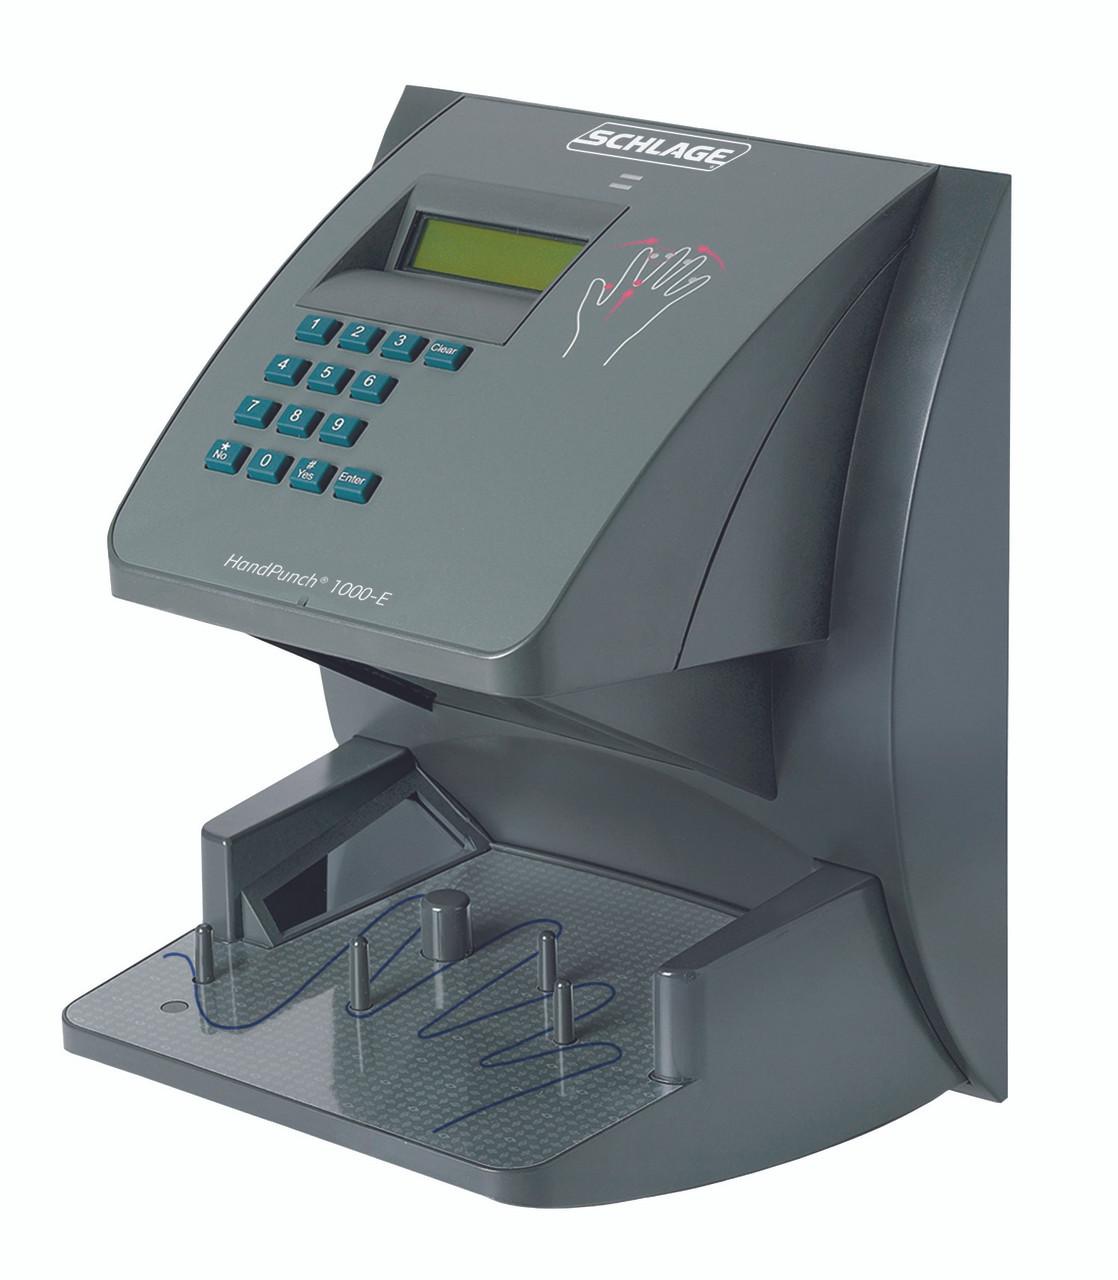 Schlage Handpunch BioMetric Terminals F Series Break Compliant HandPunch  1000 with Ethernet, memory for 100